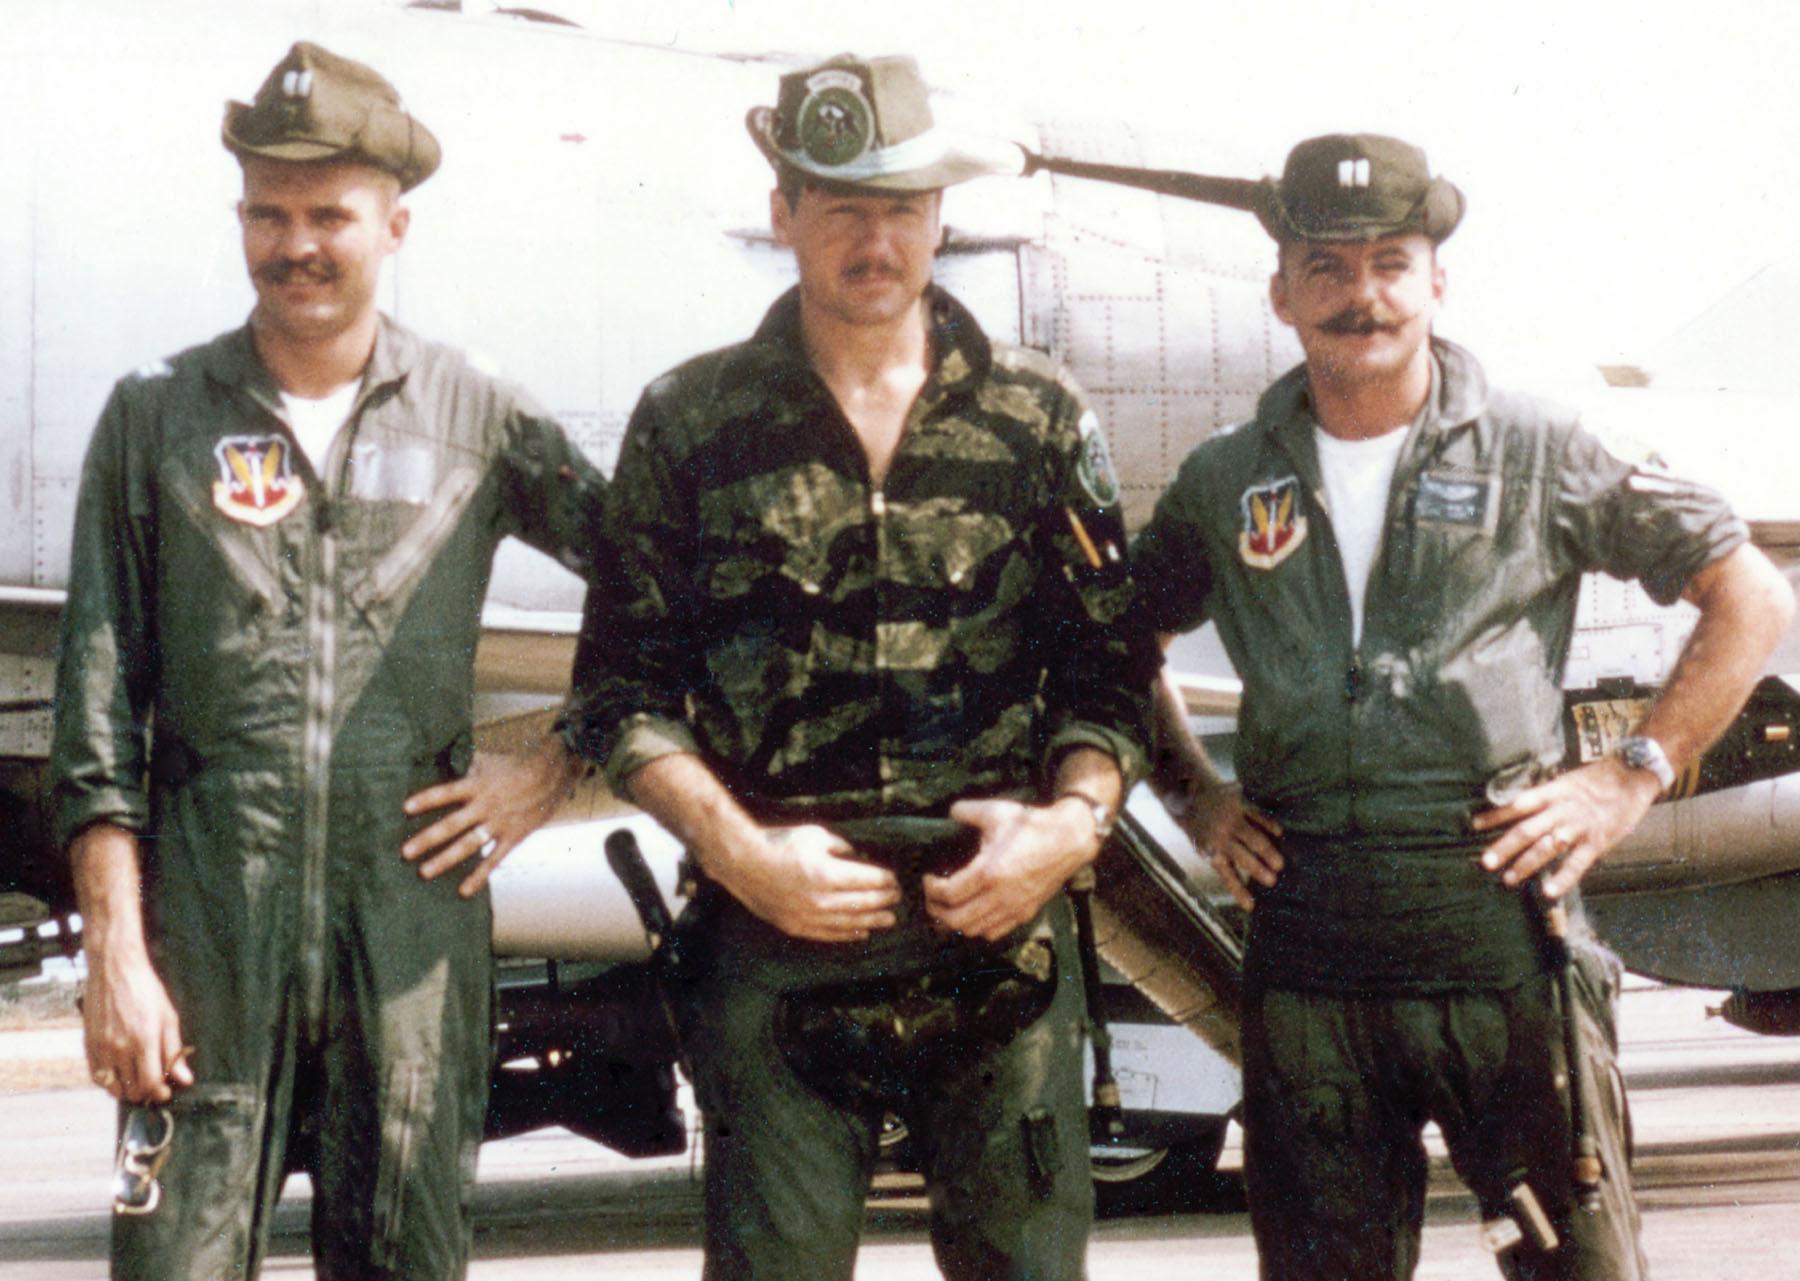 The Evac Jak Experimental Camouflage Saigon Cowboy